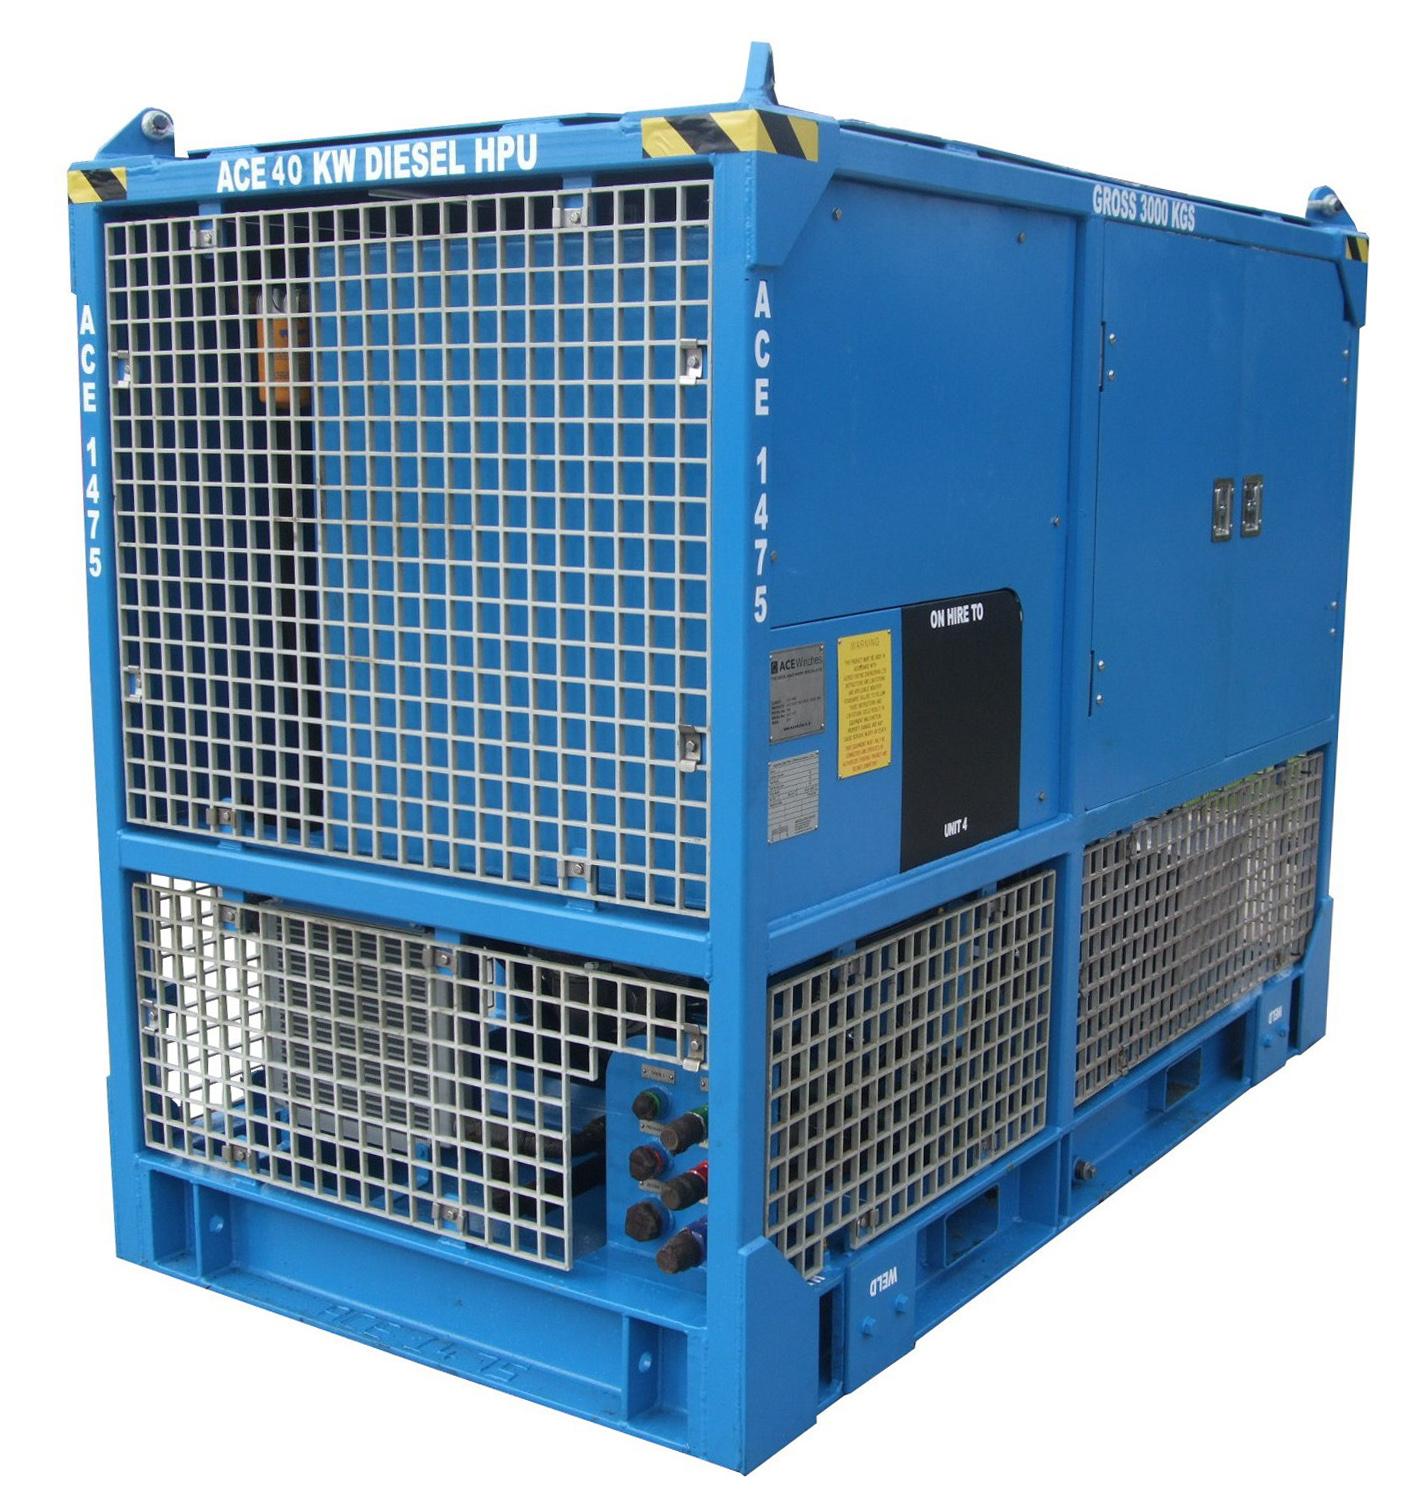 ACE 40kW Safe Area Open Loop Diesel HPU